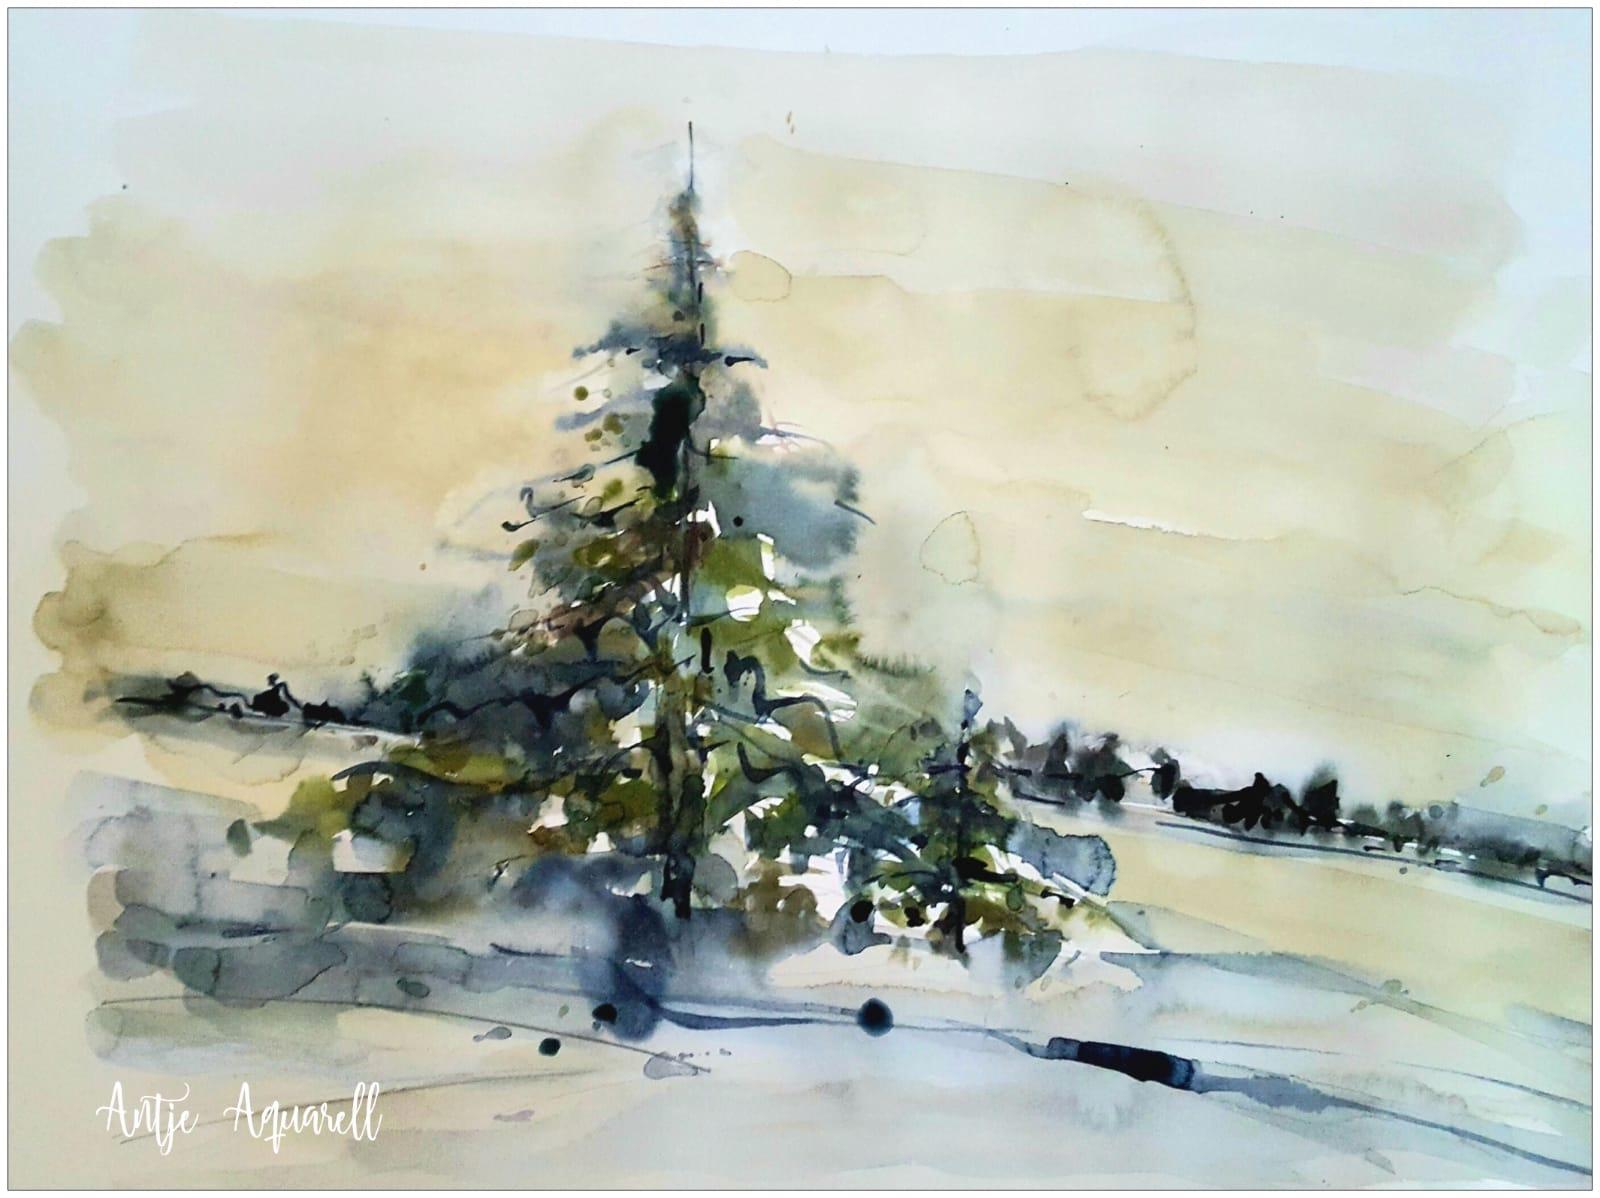 23.12., Weihnachts-Aquarell von Antje Koßmagk, Lübbenau, A14